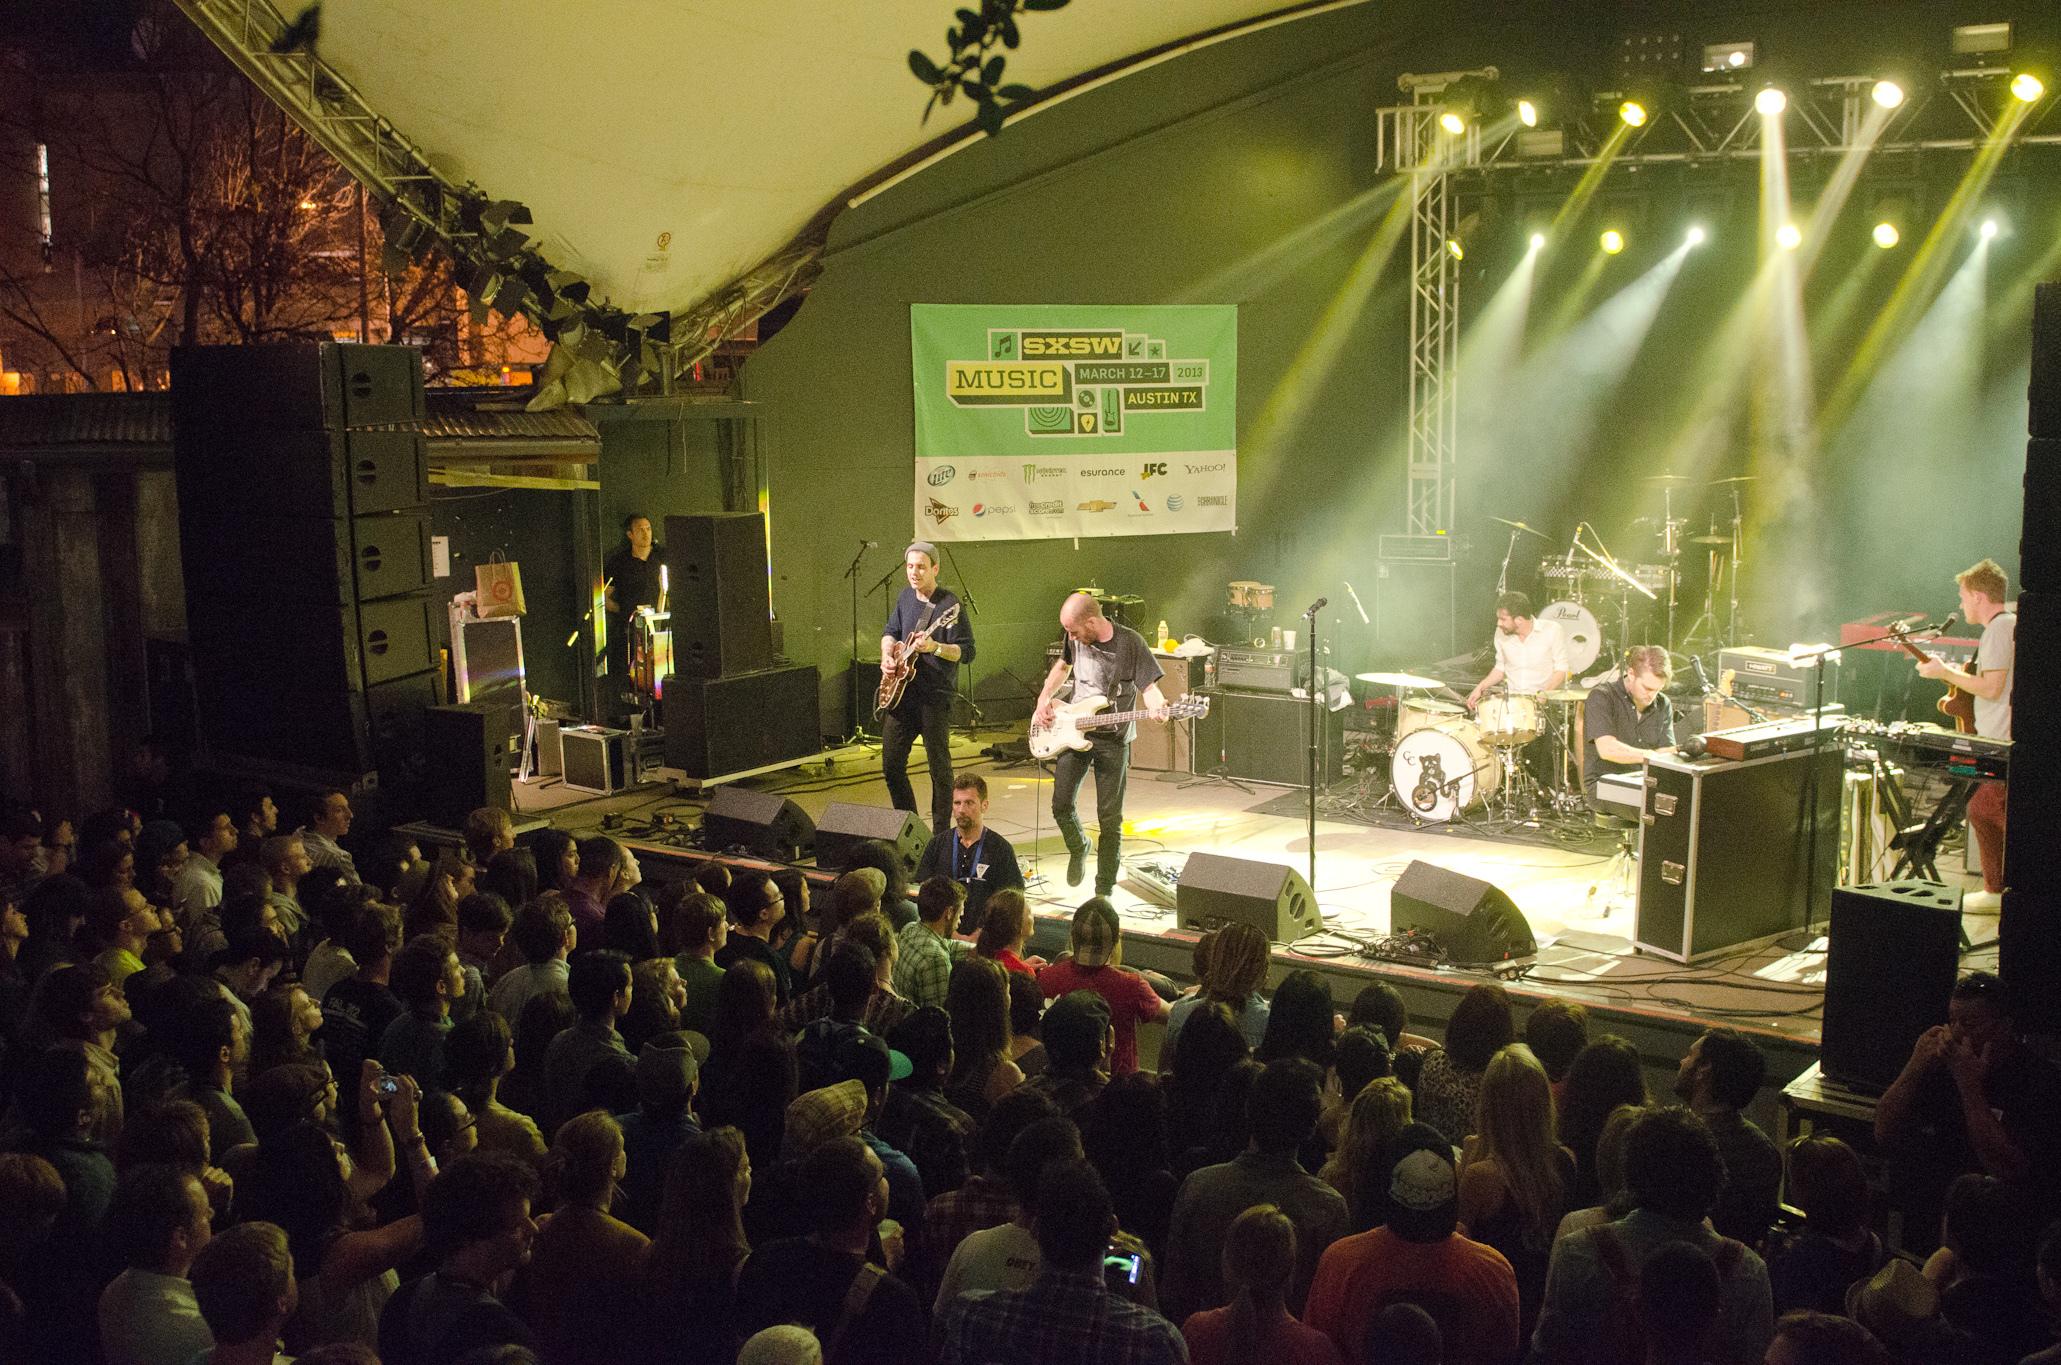 Cold War Kids at SXSW Music Festival 2013